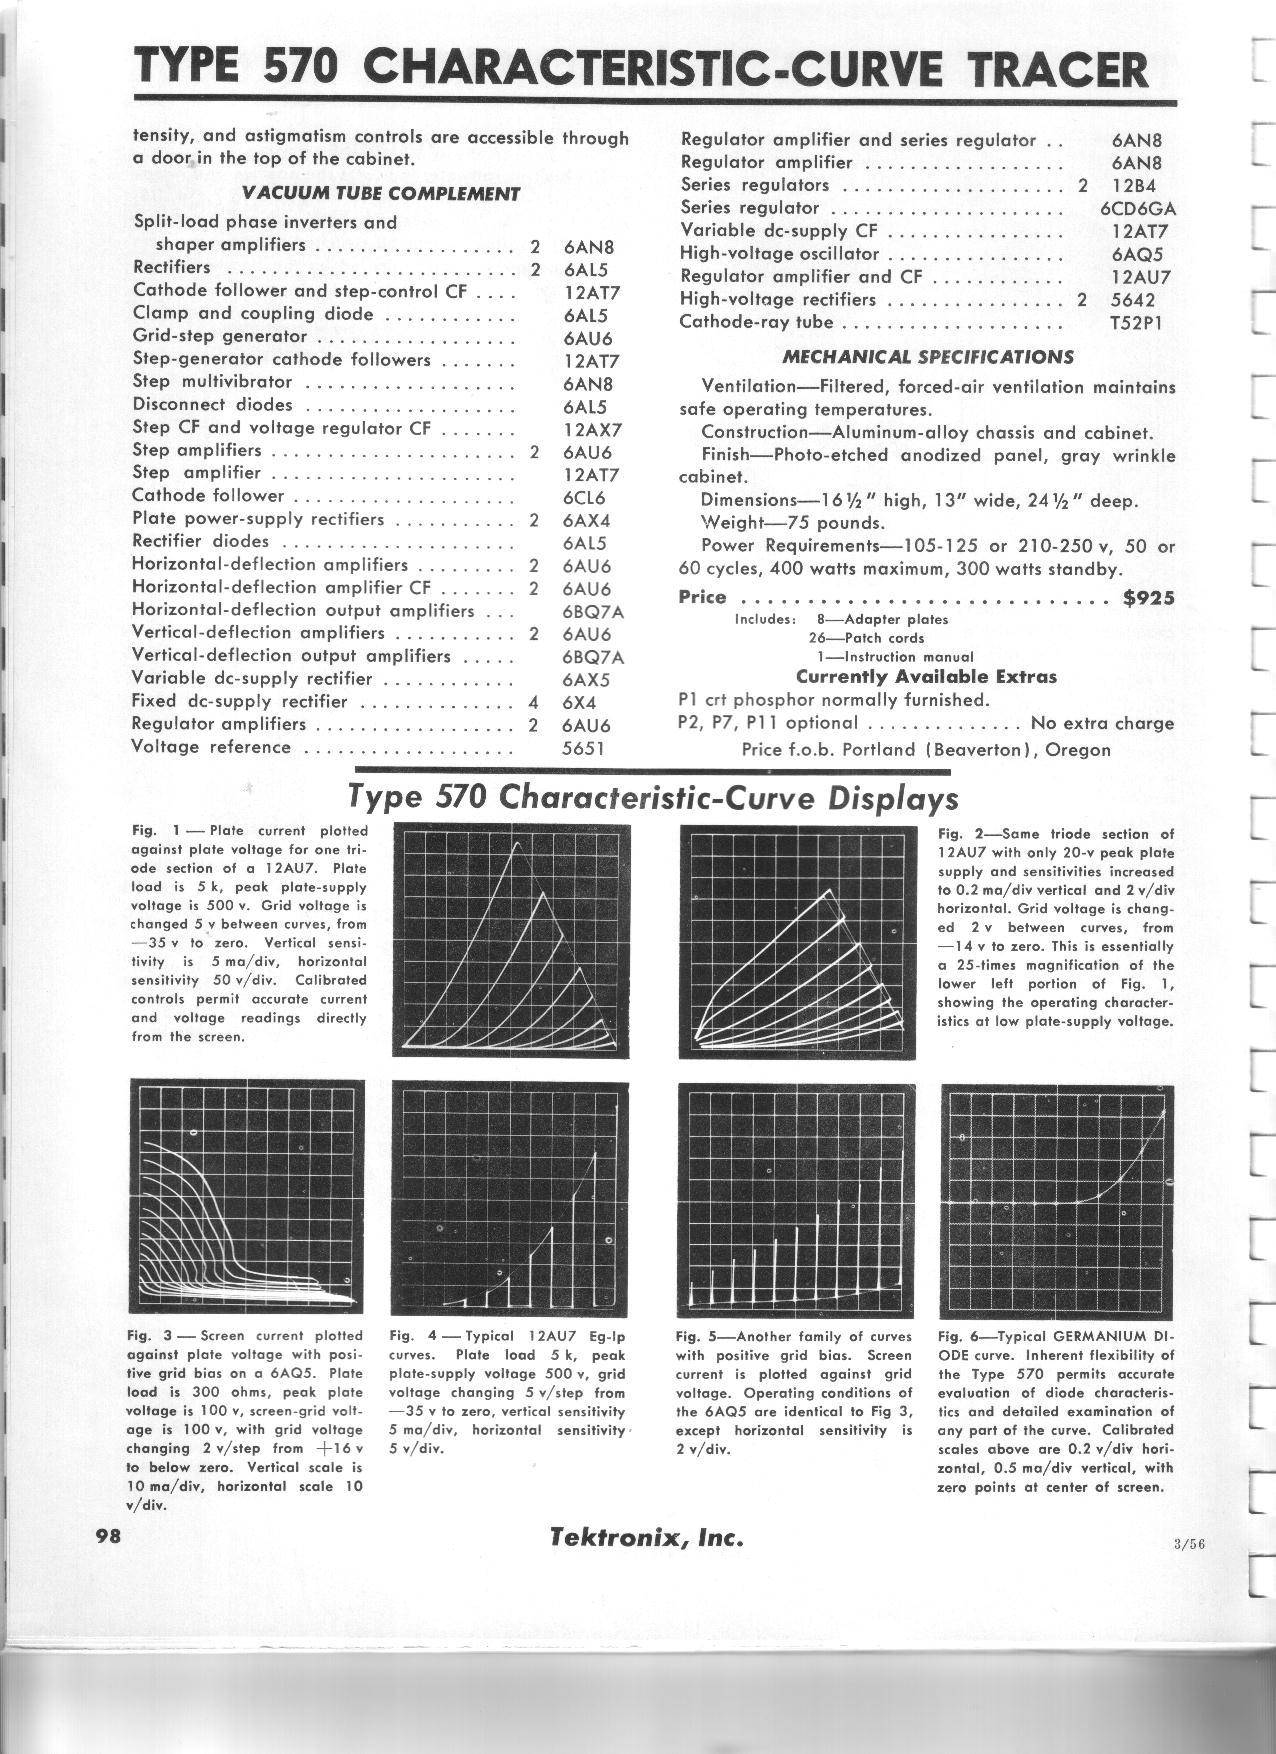 Tektronix Oscilloscope